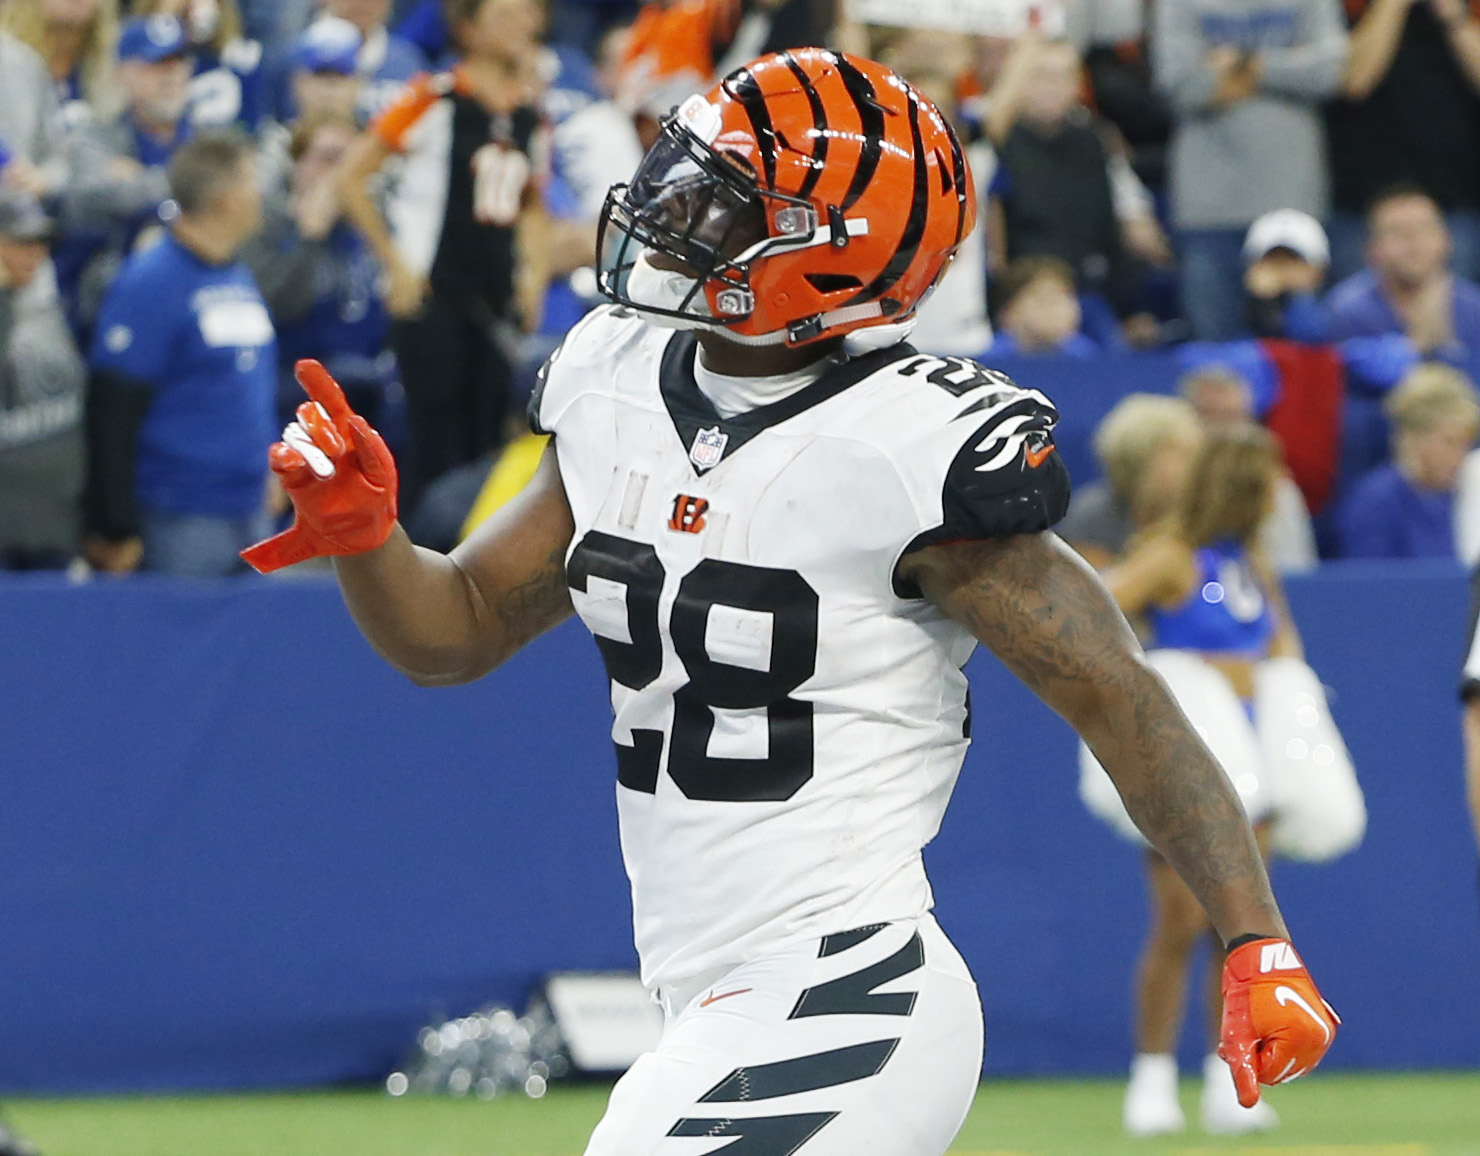 Refocused, NFL Week 1: Cincinnati Bengals 34, Indianapolis Colts 23